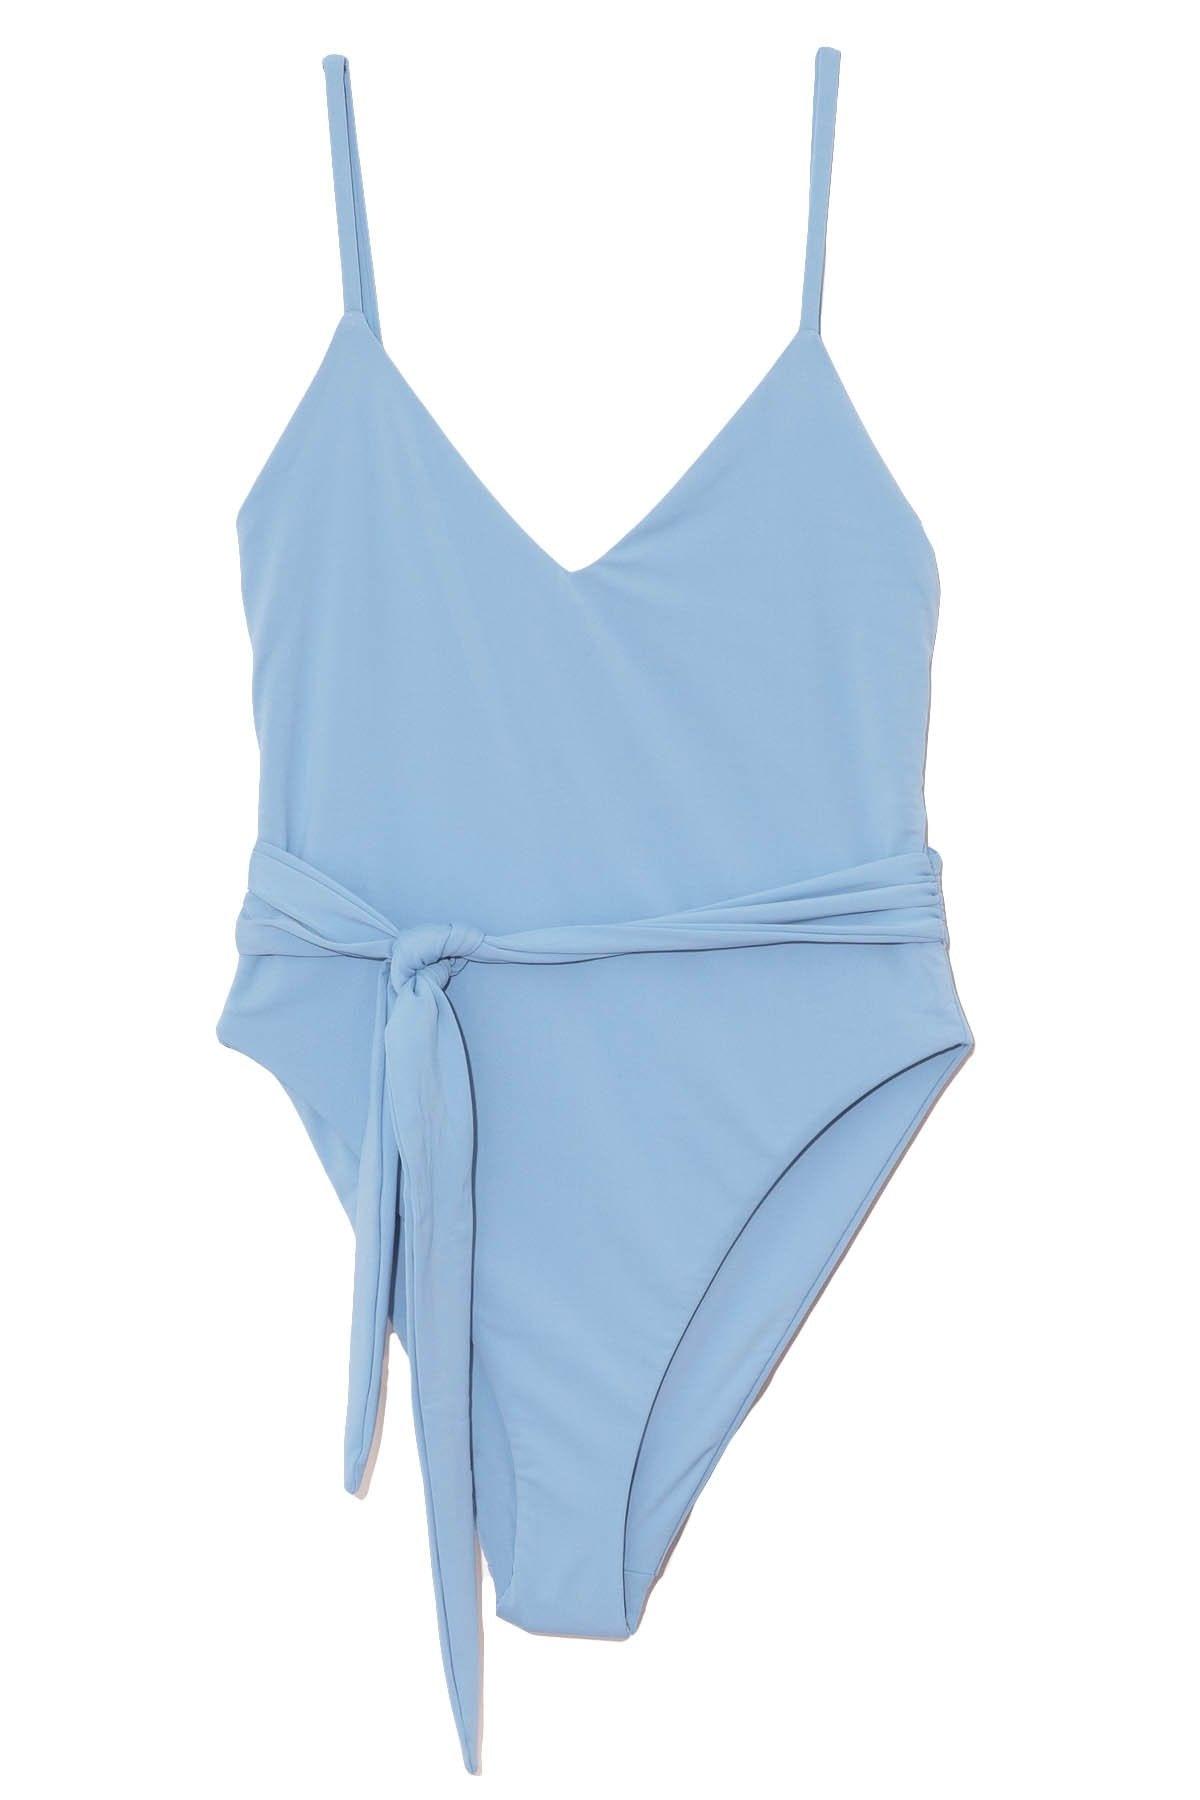 Gamela Swimsuit in Blue: image 1